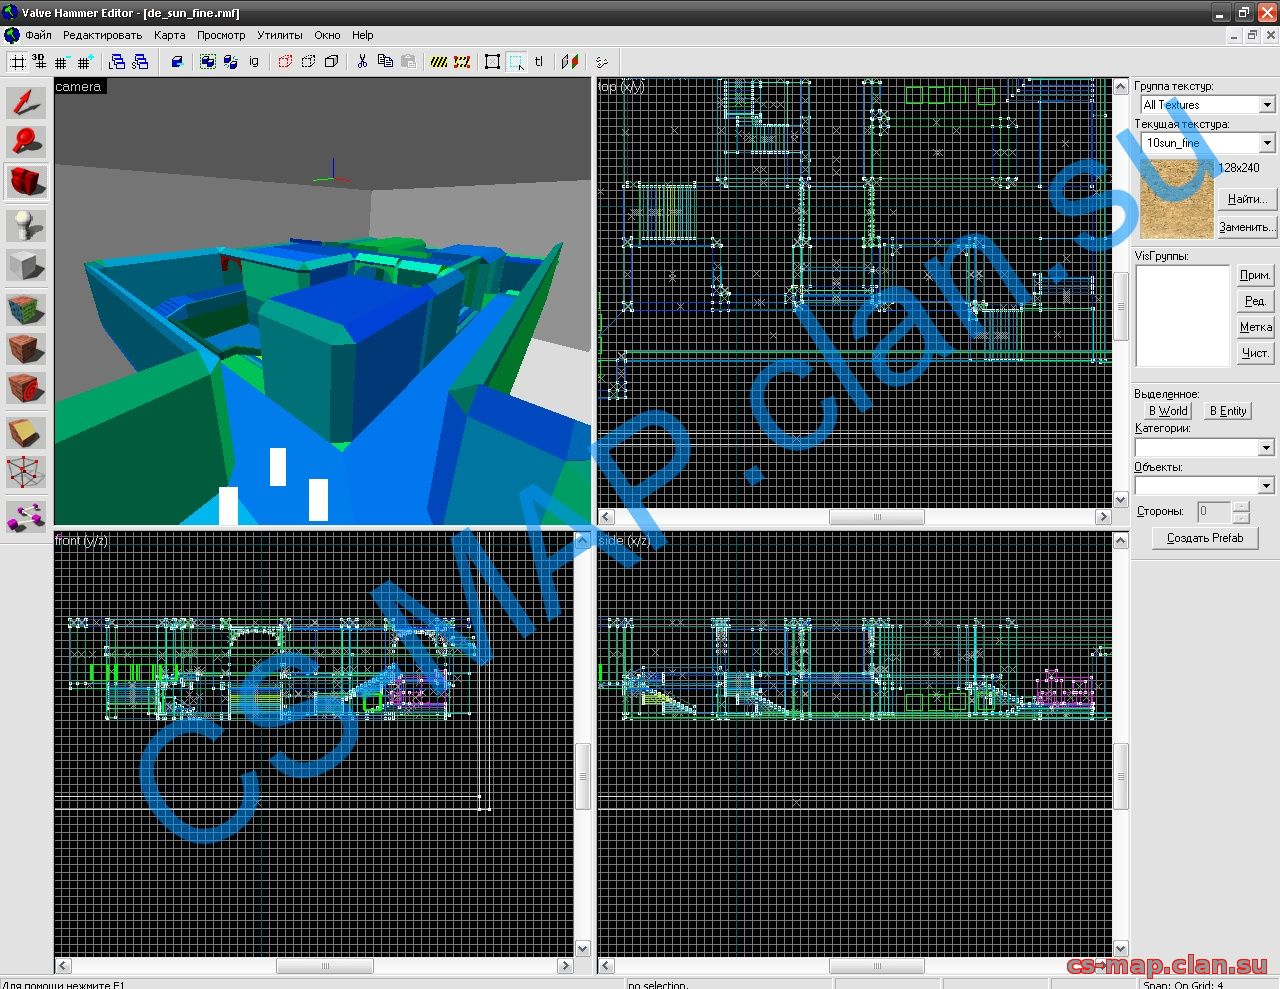 Valve hammer editor 35 full version essentialpim pro 557 serial number ralenti after effect cs6 serial number